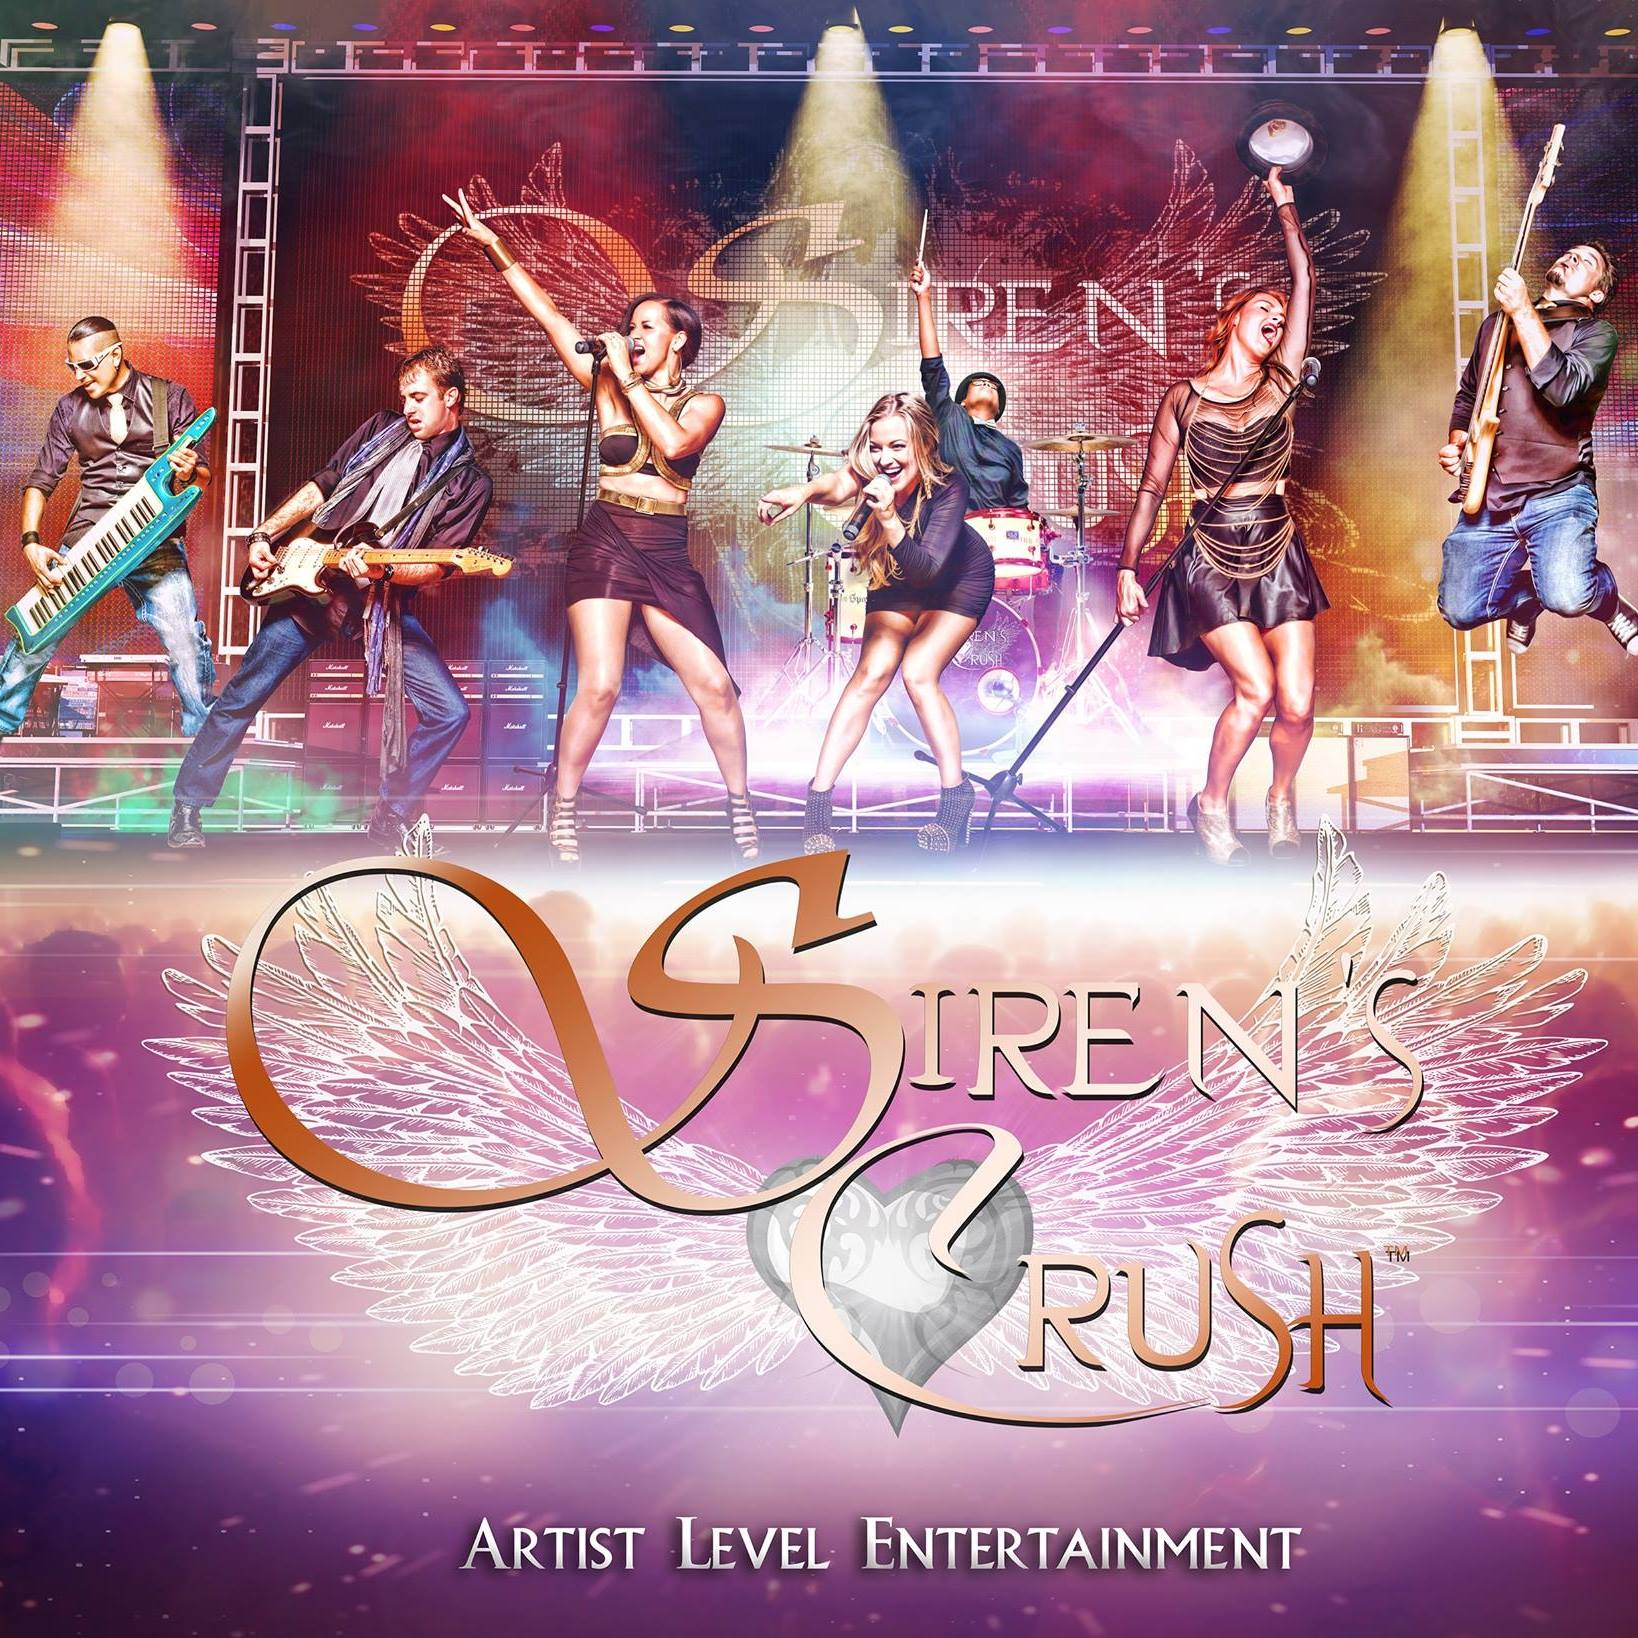 sirens crush_inner voyage entertainment_san diego_03.jpg